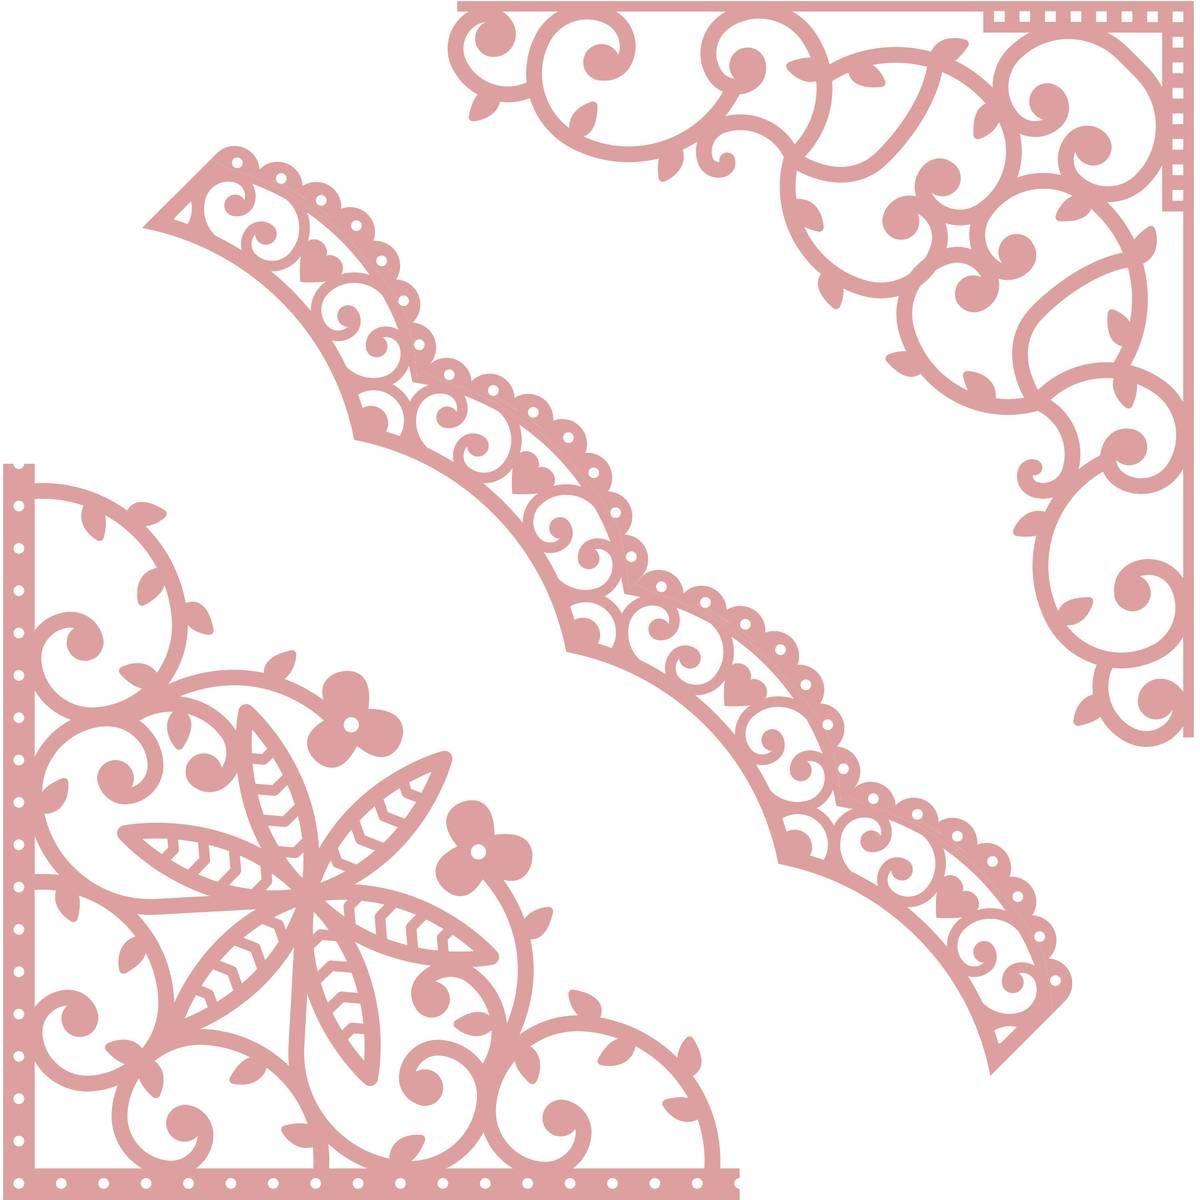 Intricut Flourish Dies 3 Pieces | Cutting Files ...